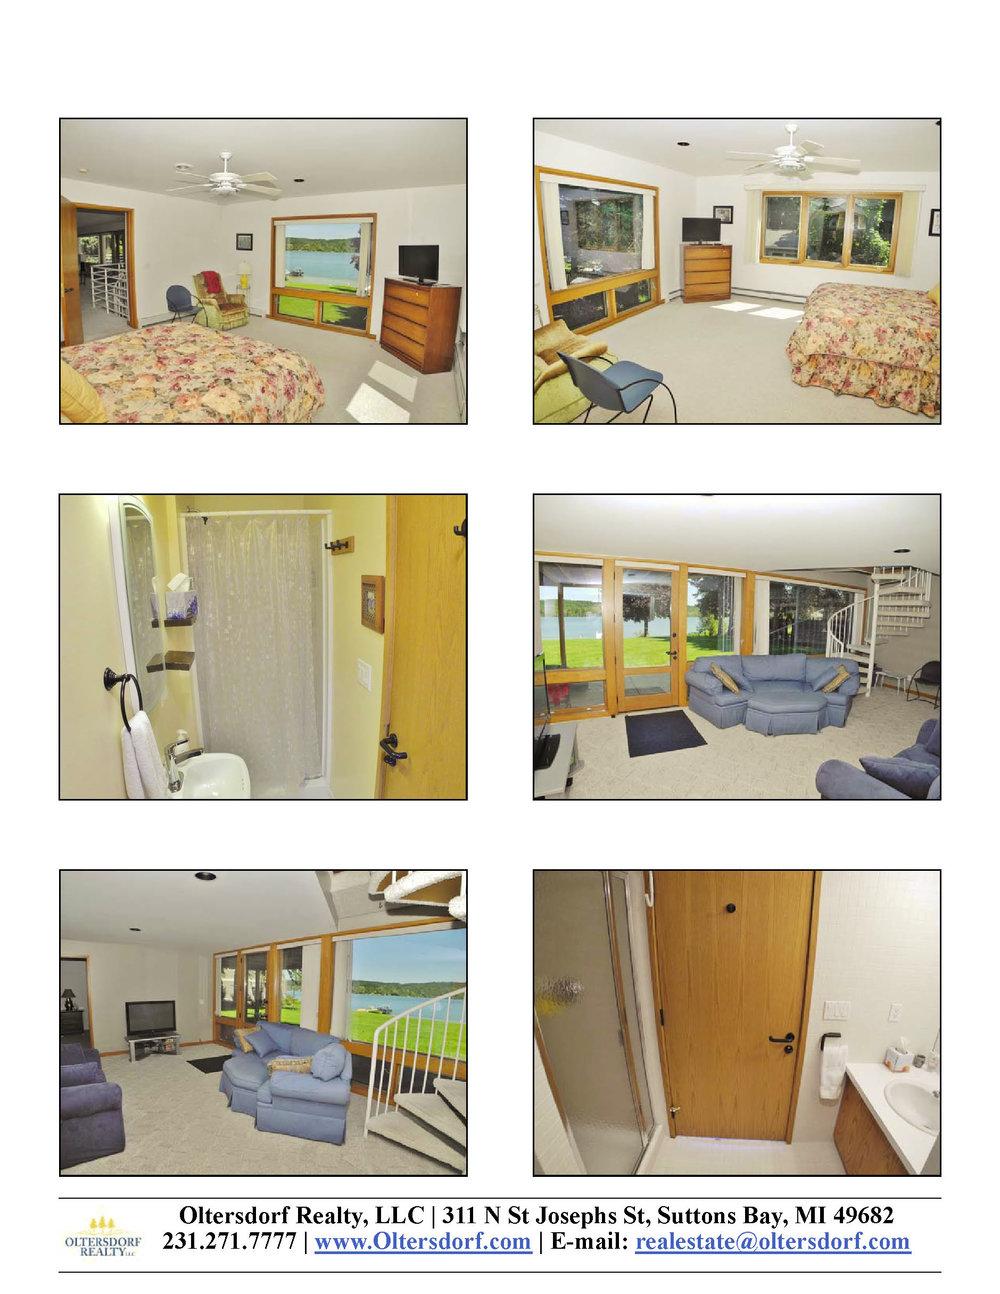 2091 S Lake Shore Drive - Oltersdorf Realty LLC Marketing Packet_Page_06.jpg